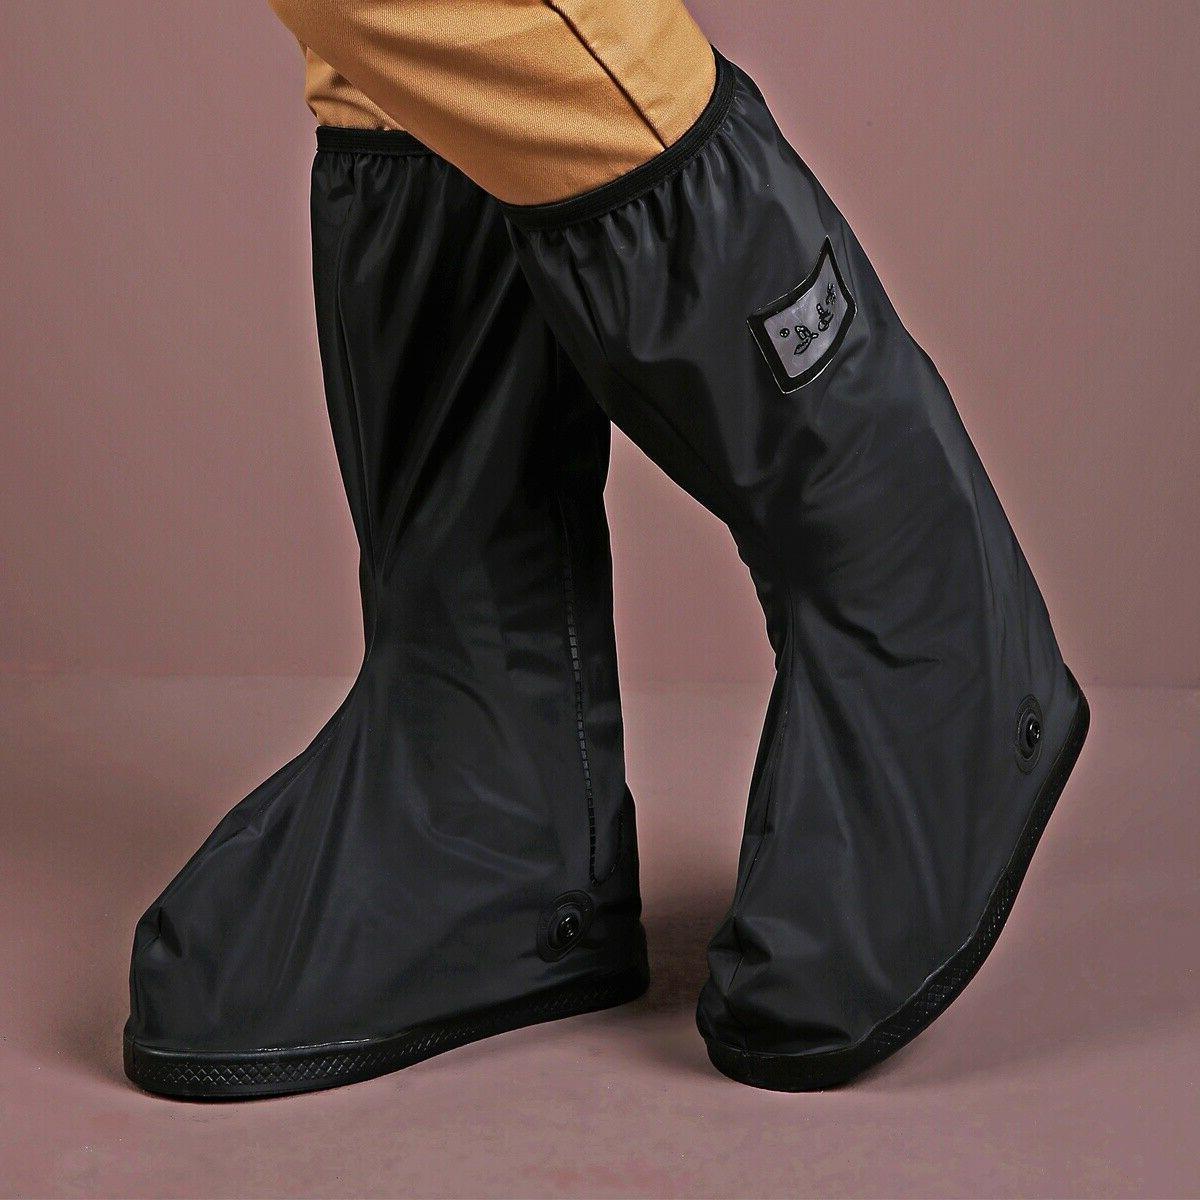 rain shoe covers waterproof for men women